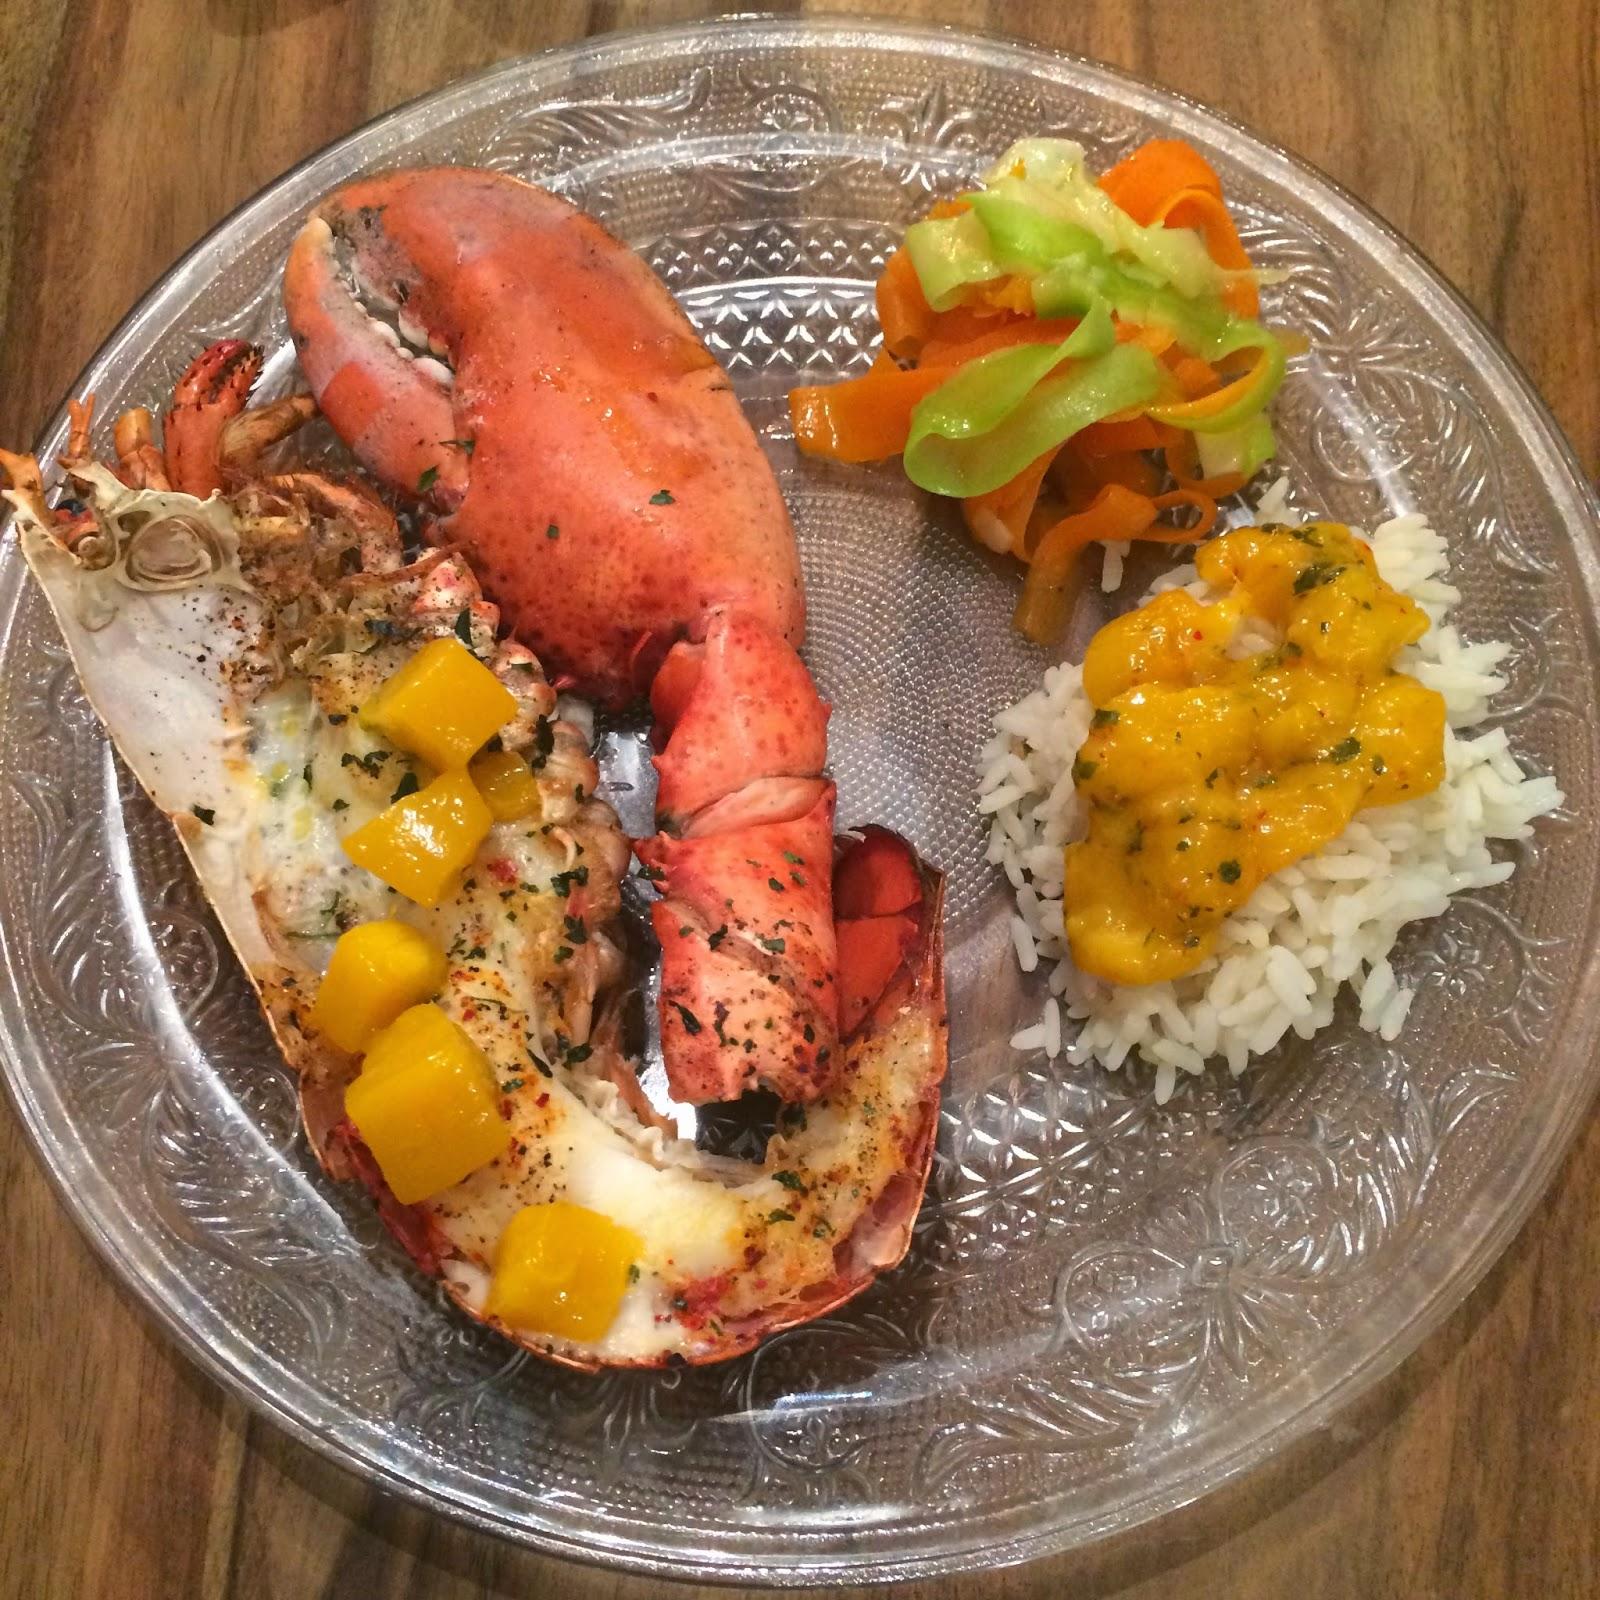 Demi homard grillé et sa sauce mangue